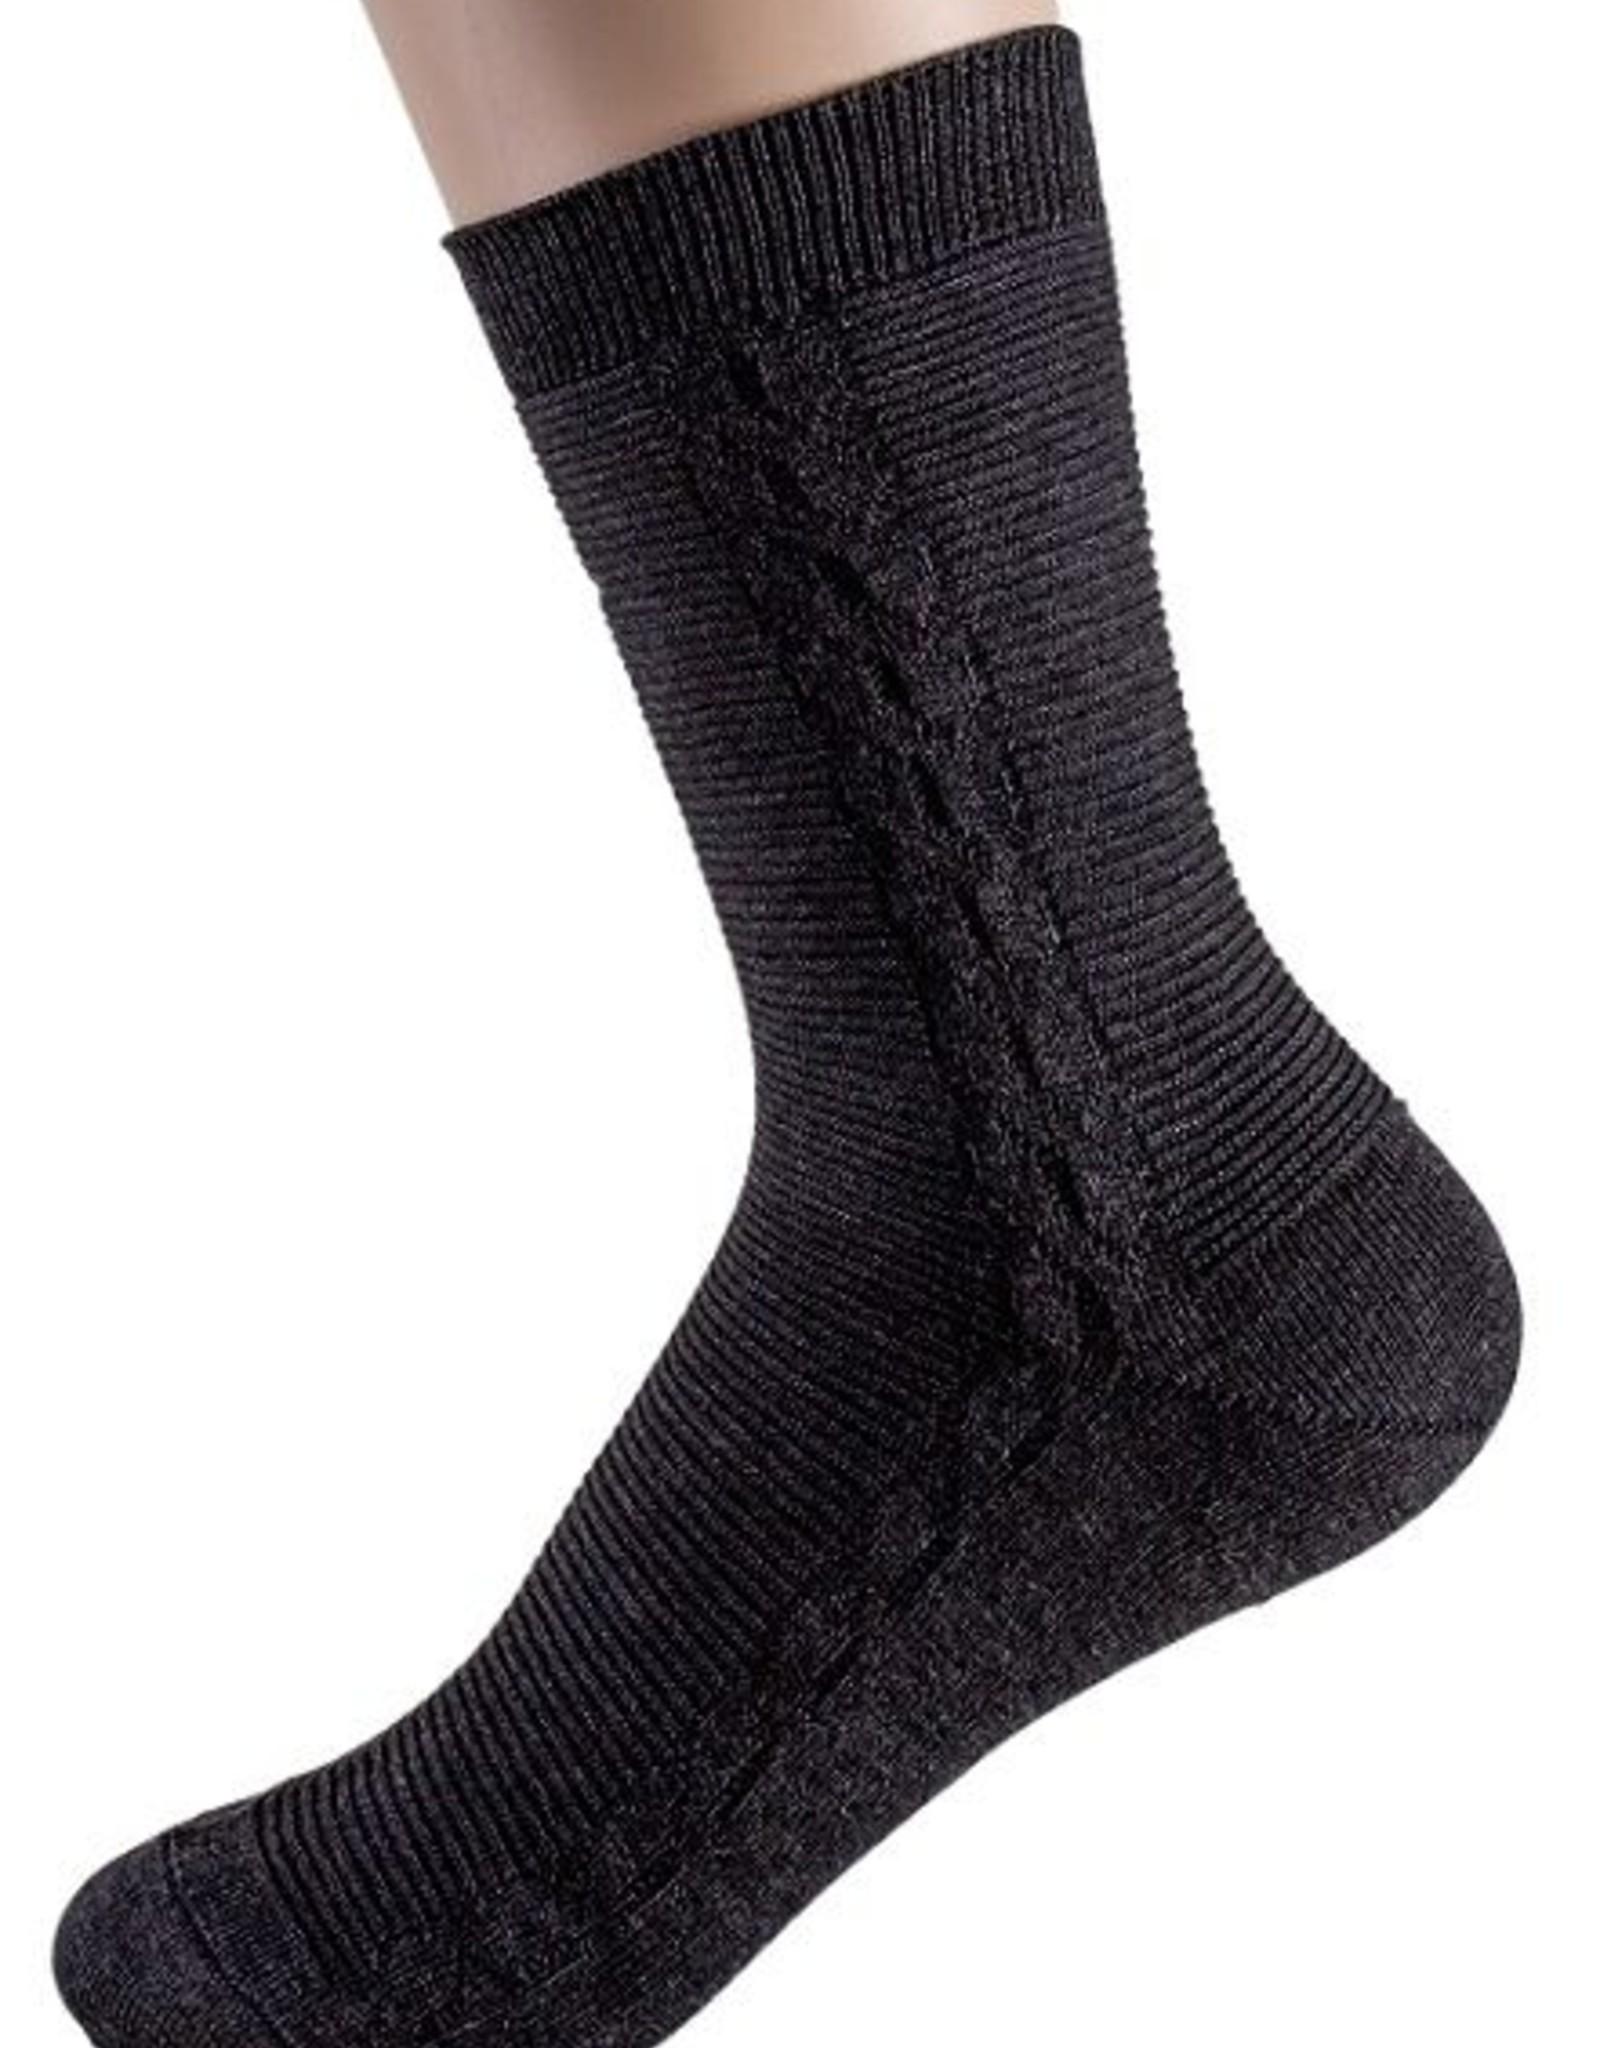 Condor Condor Cable Sock